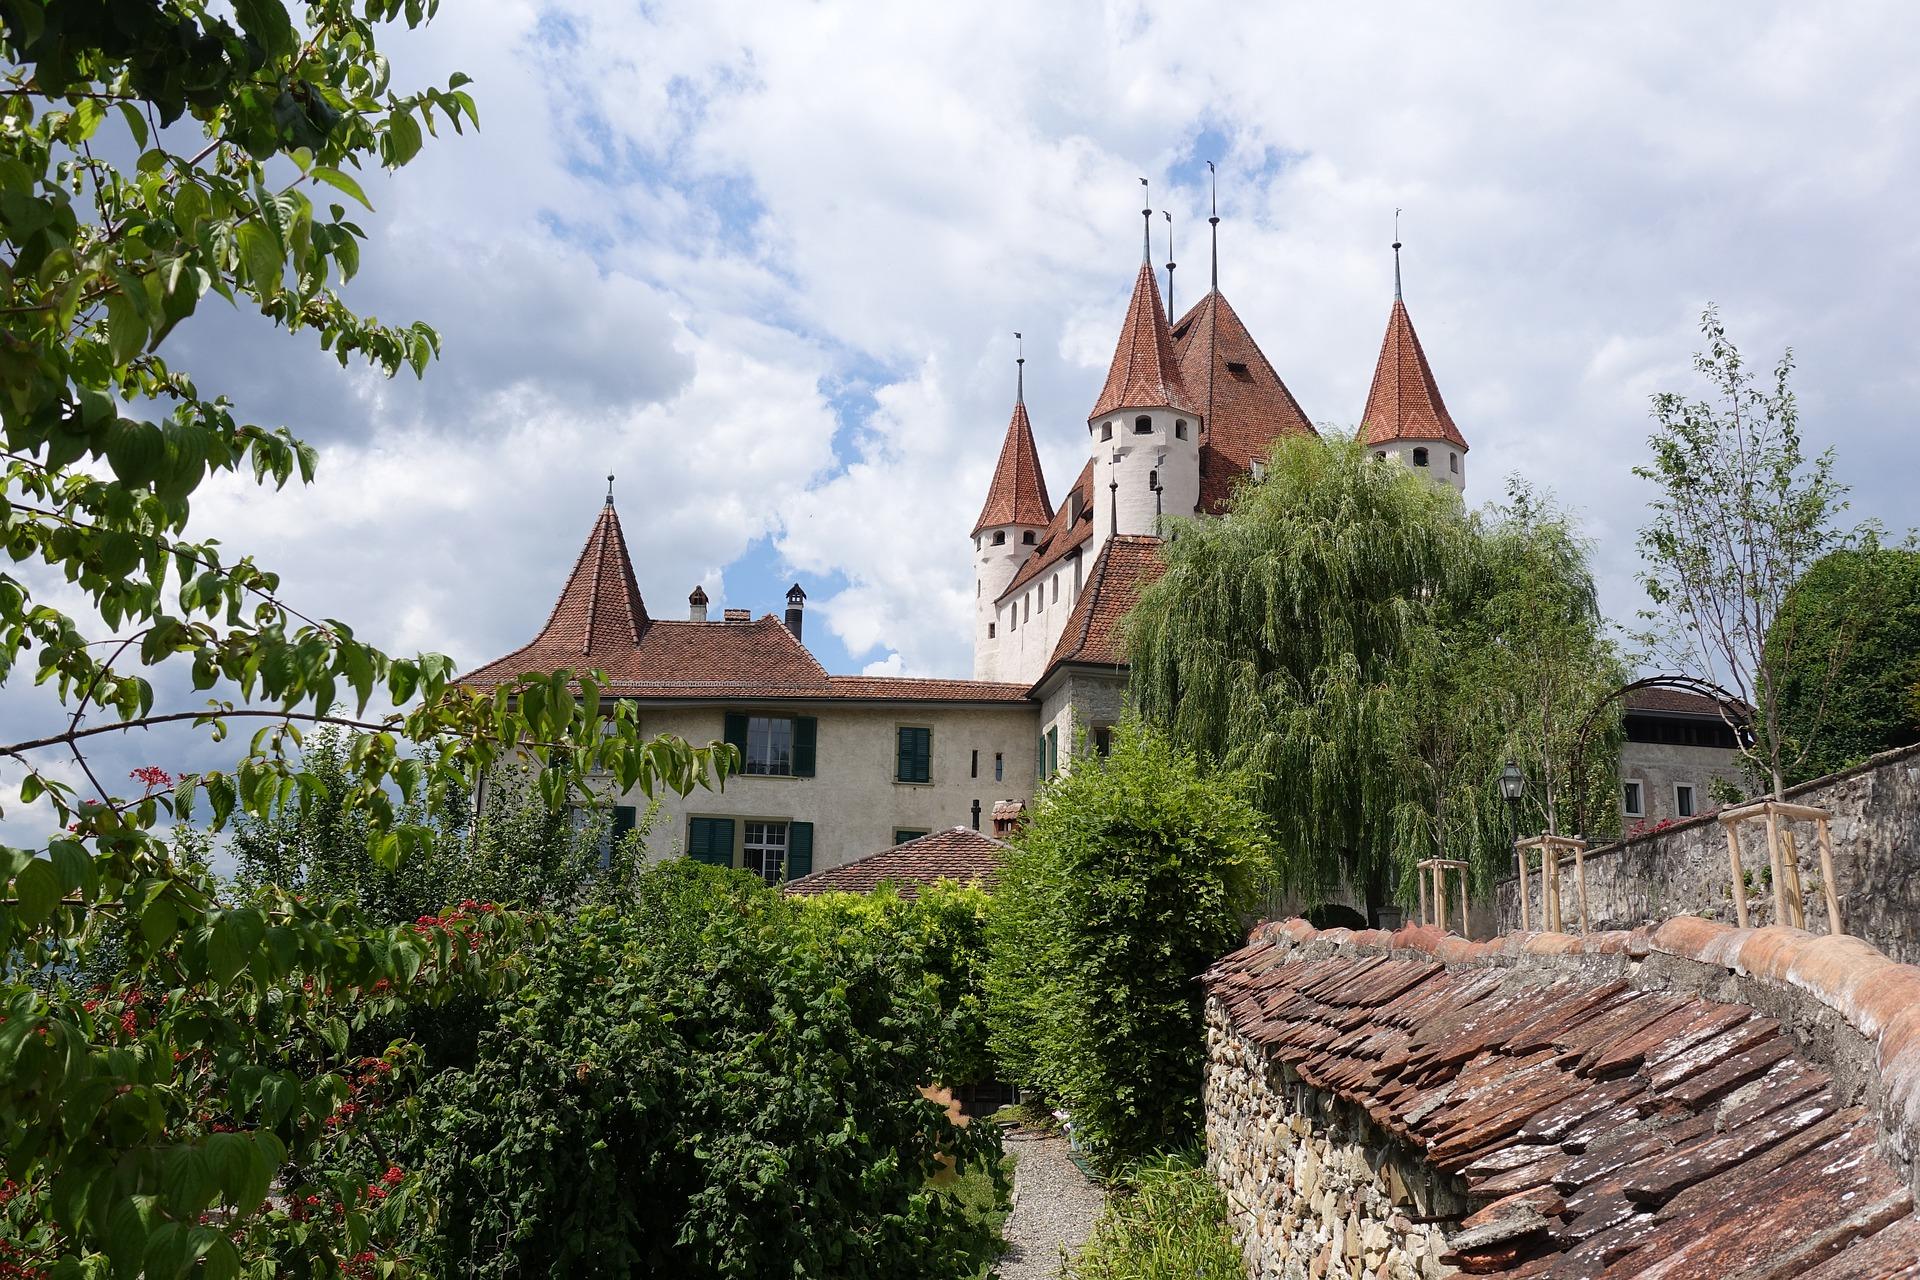 Thuner Burg